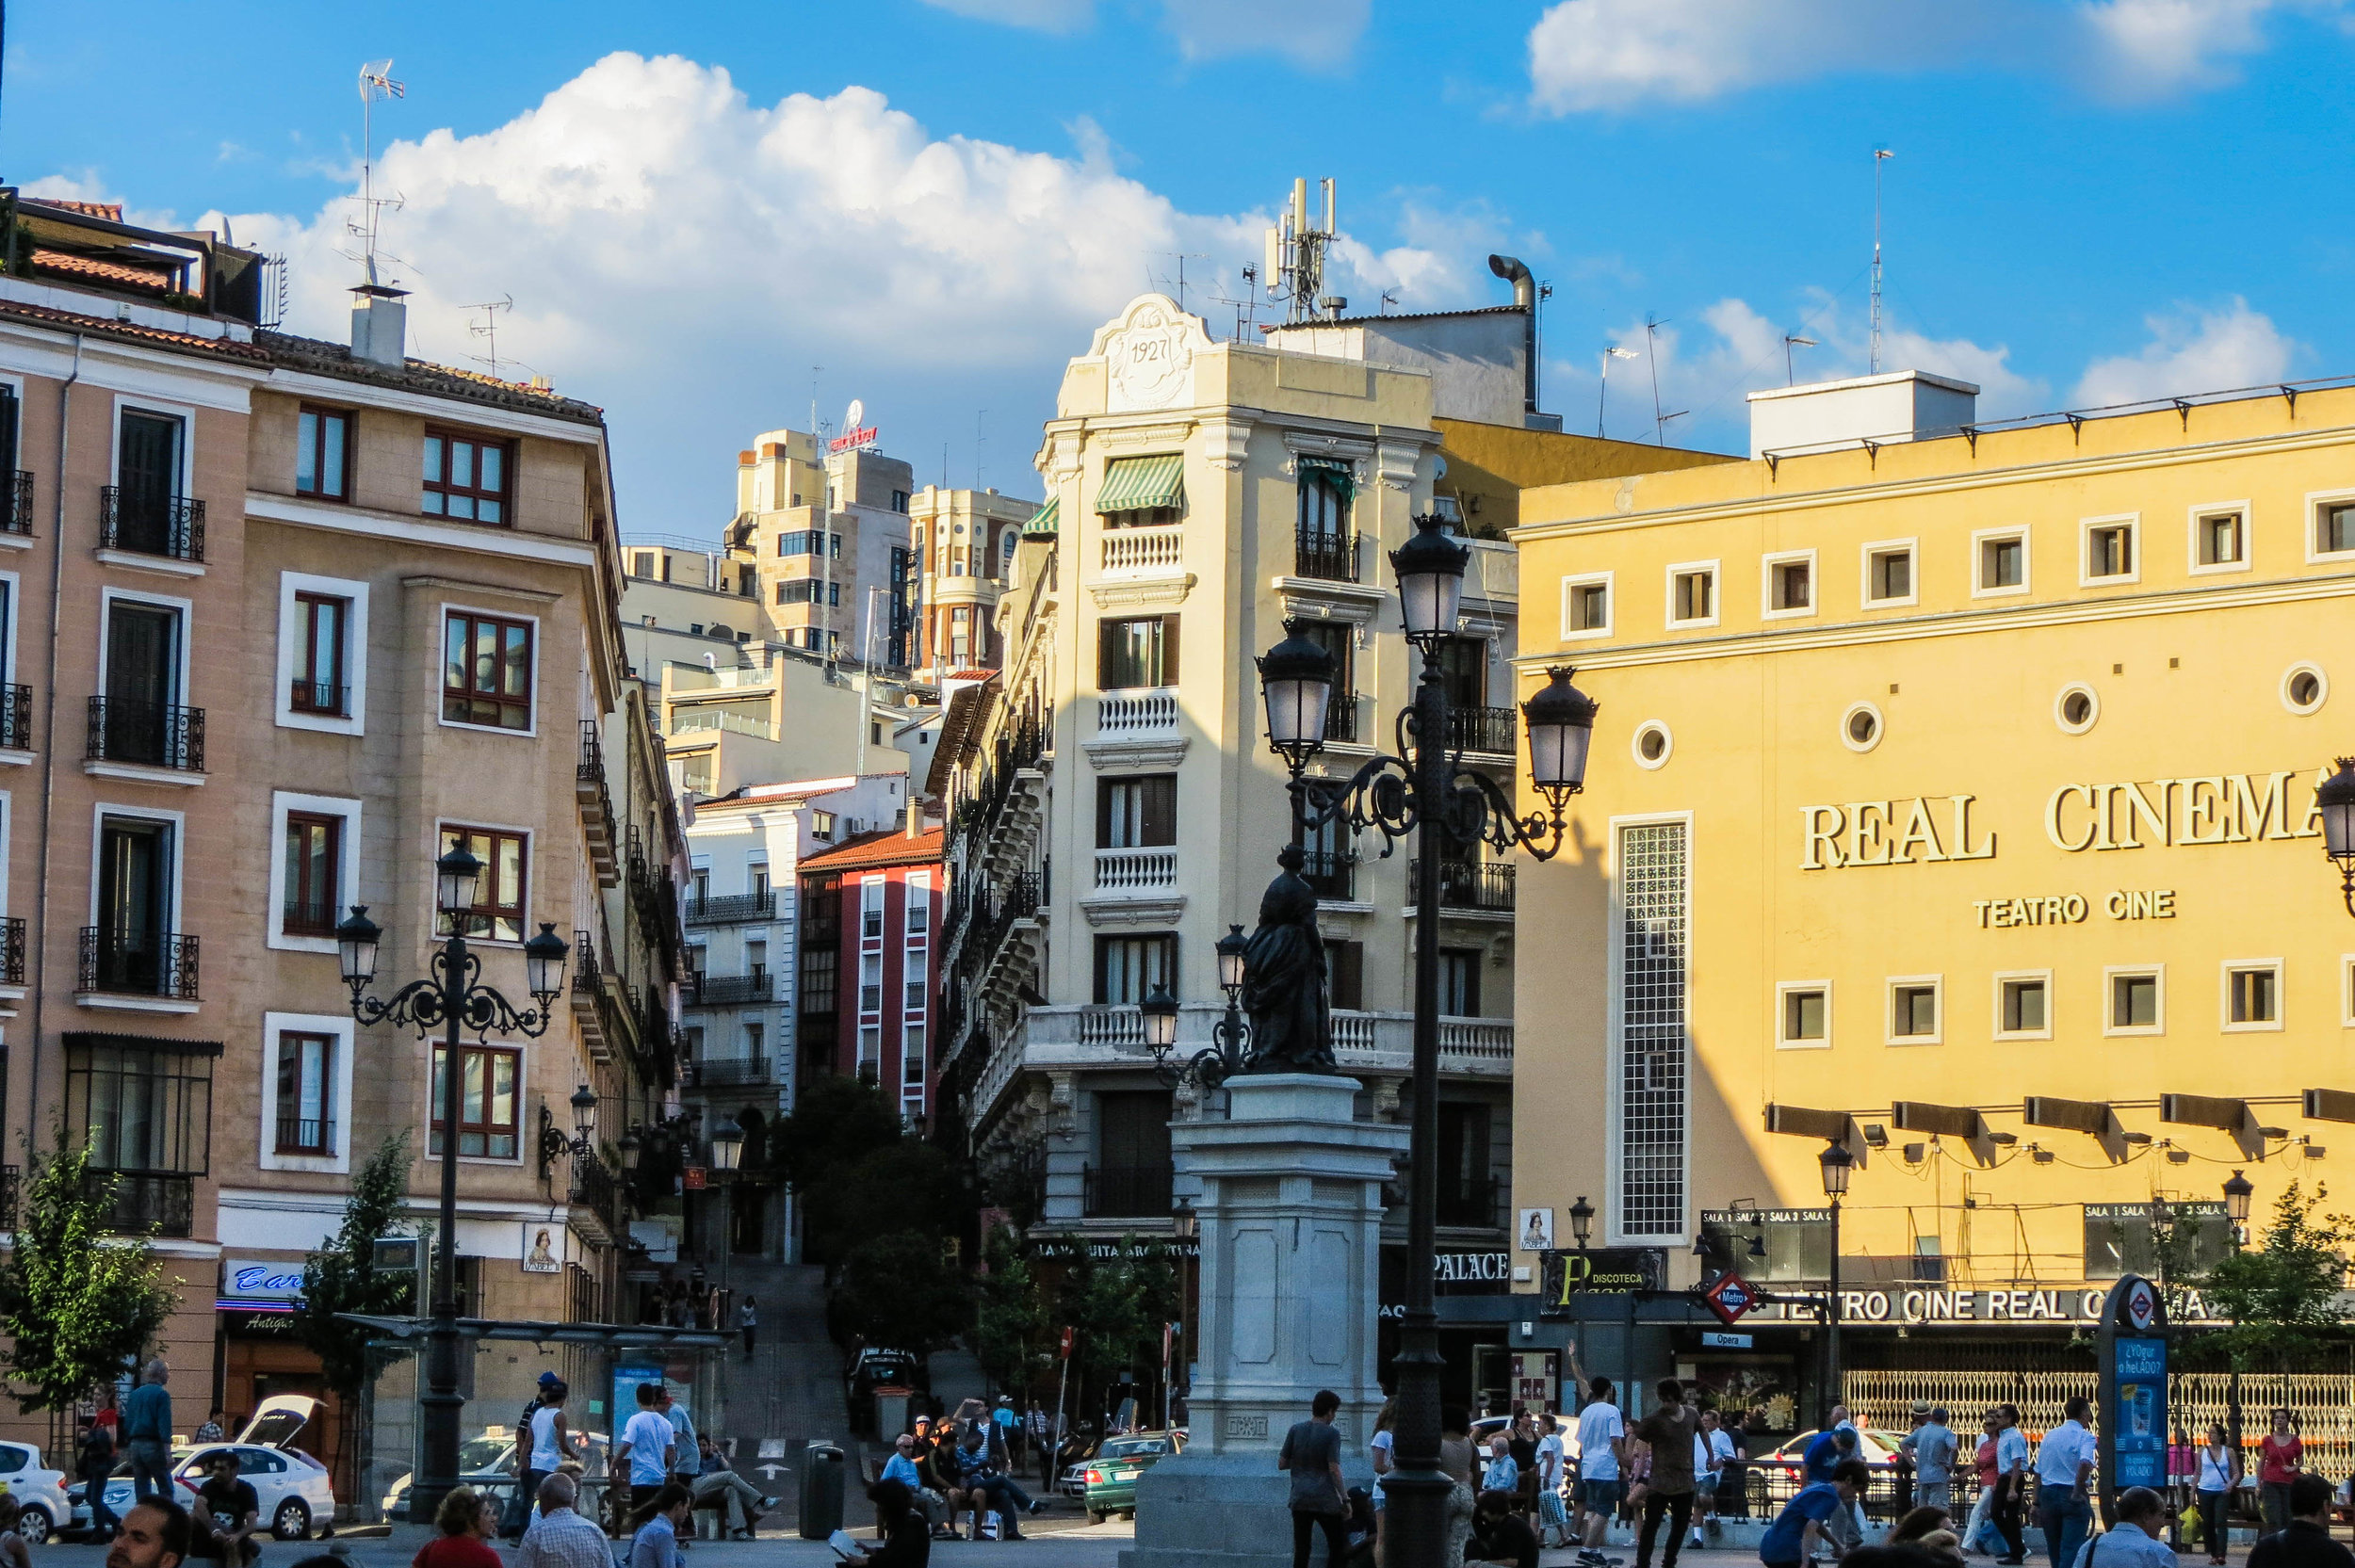 madrid-spain-streets-summer-31.jpg